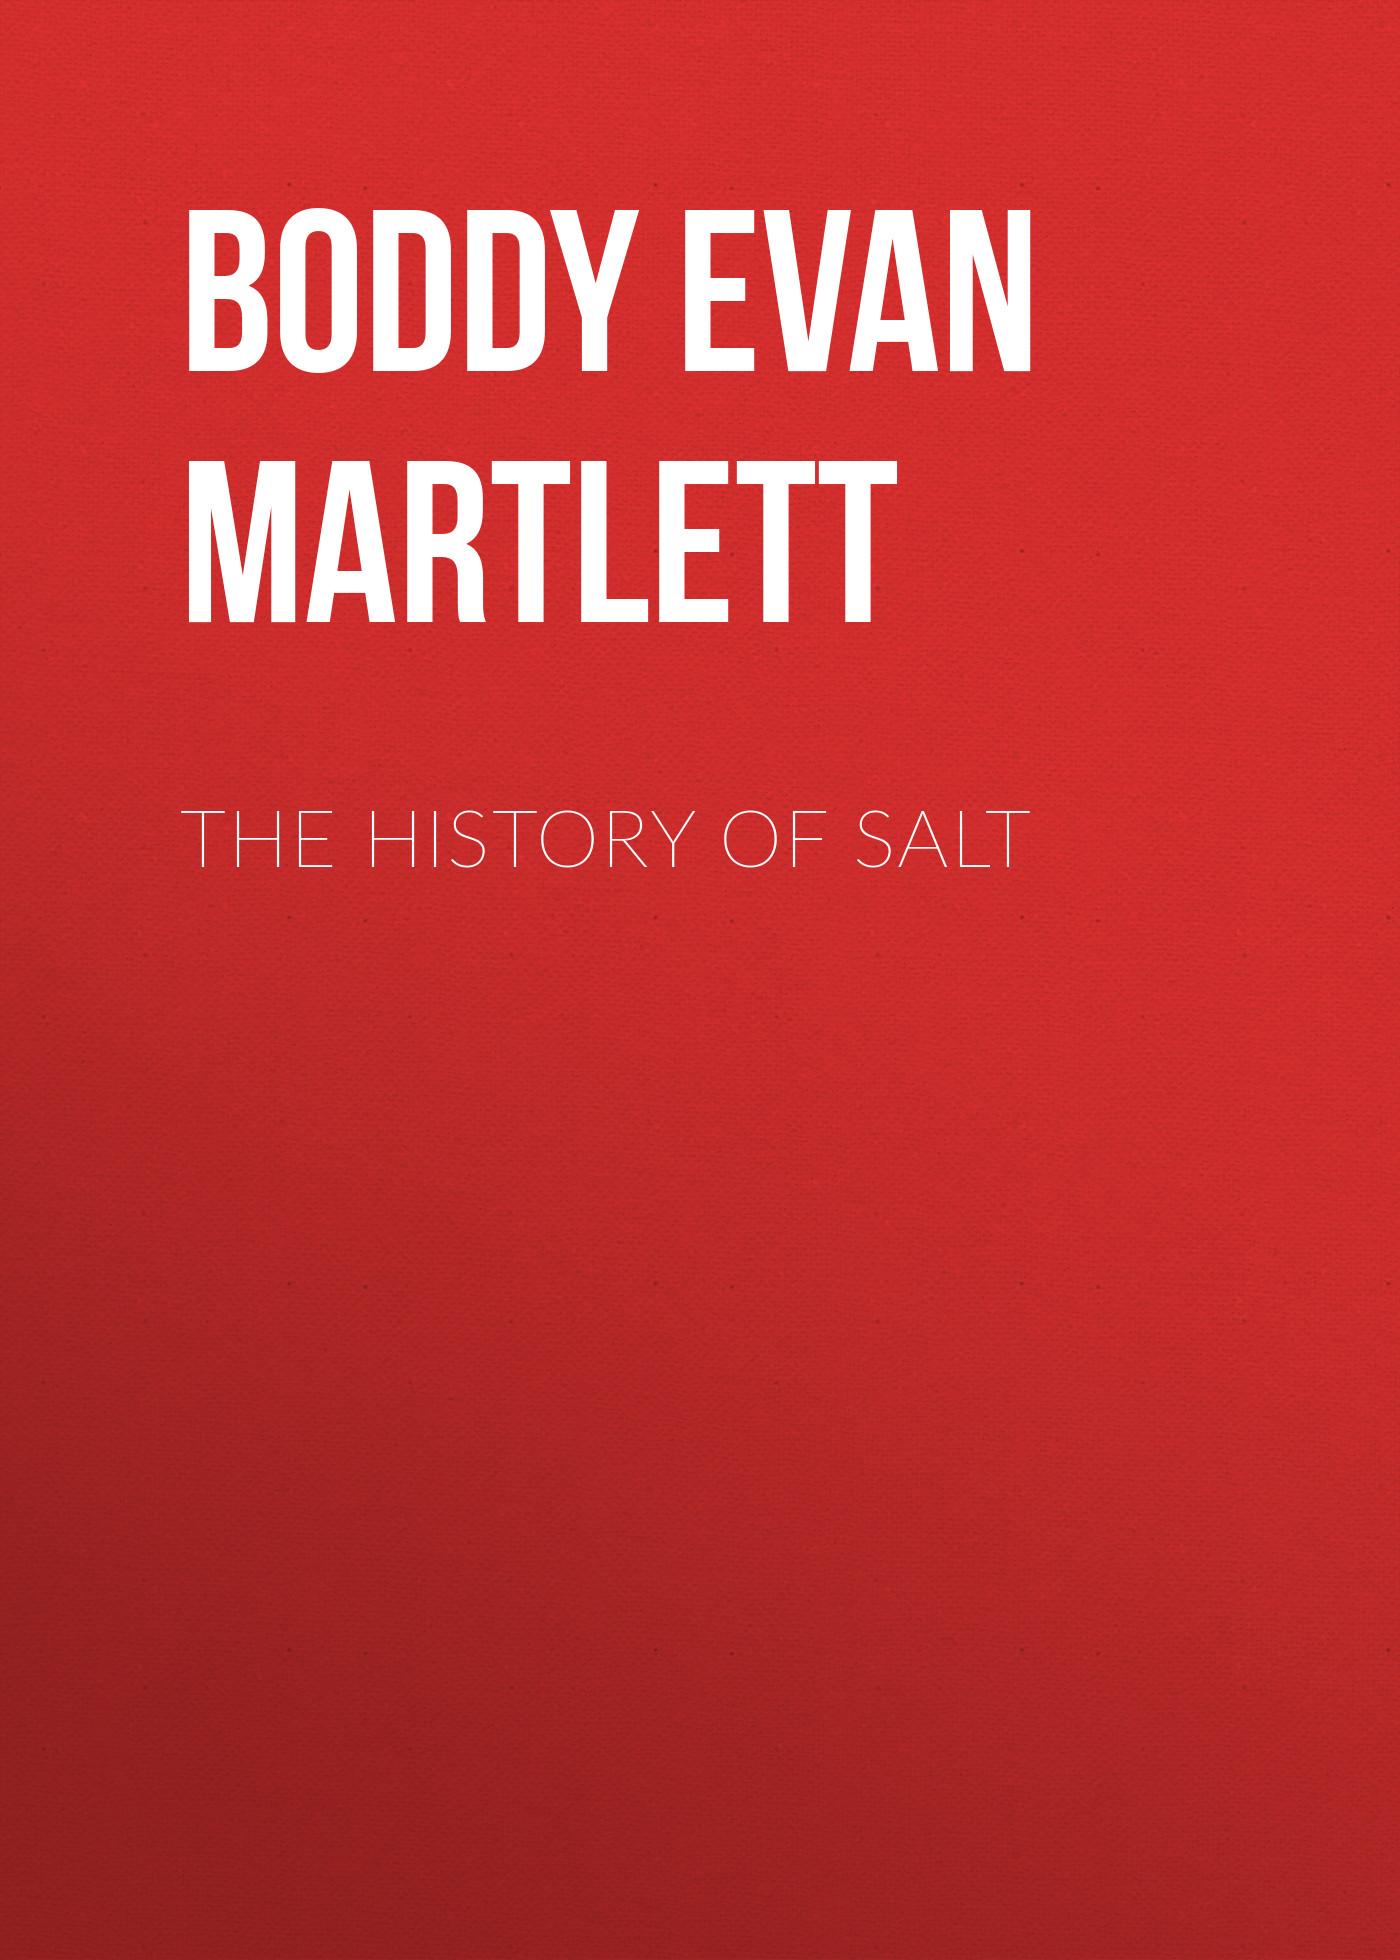 Boddy Evan Martlett The History of Salt